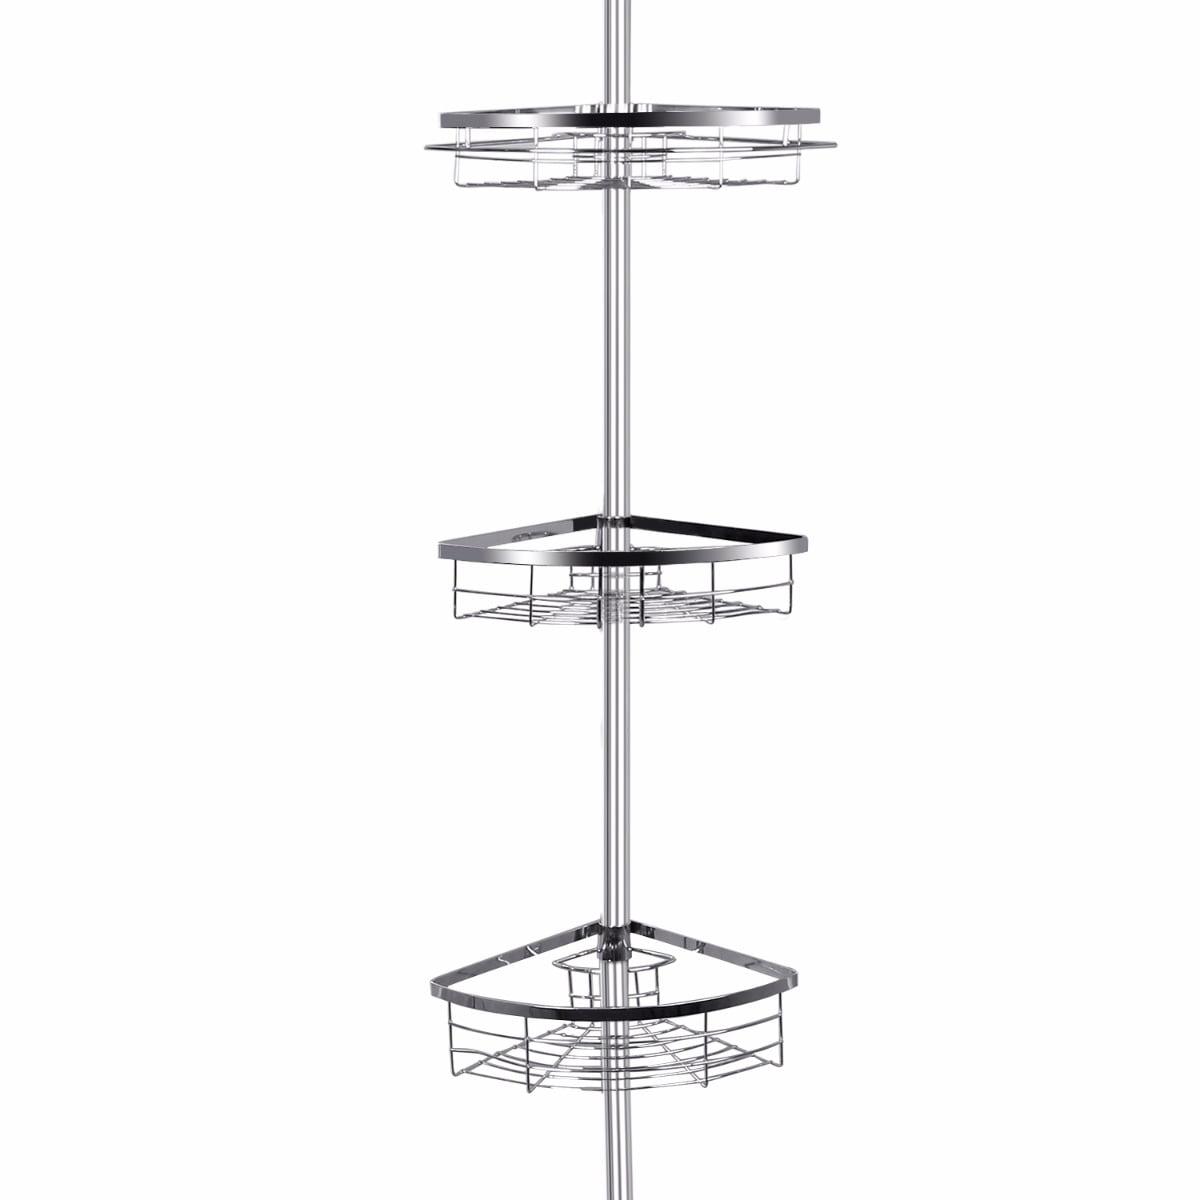 Lifewit Corner Shower Caddy 3 Tier Adjustable Bathroom Constant Tension Corner Pole Caddy... by